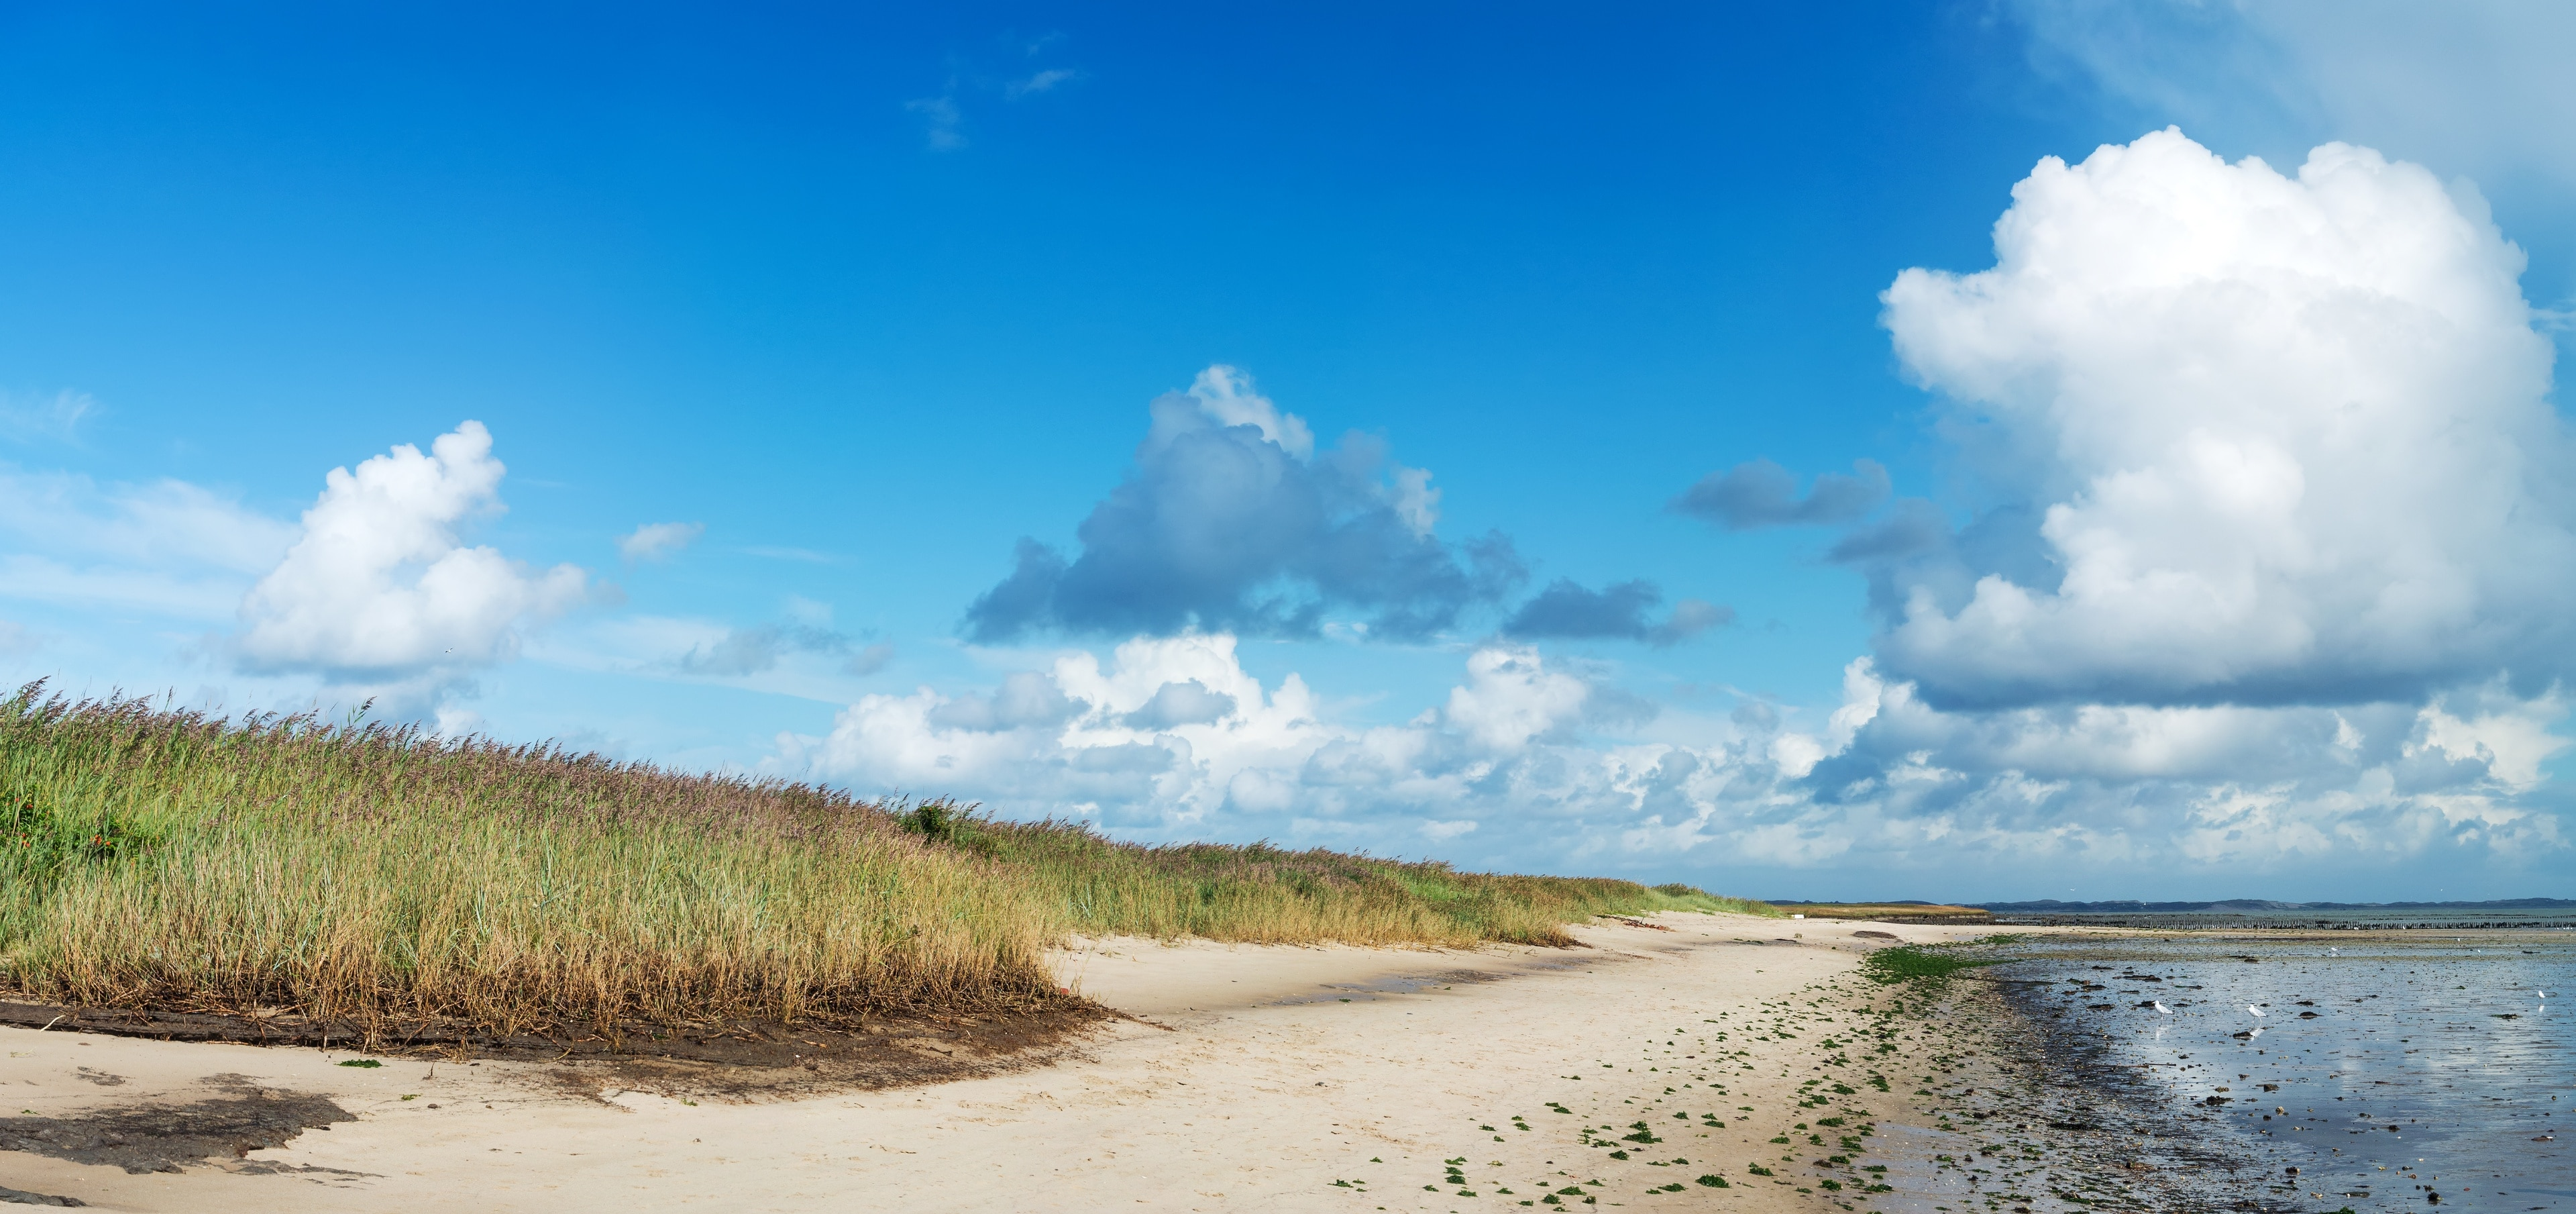 Arrondissement de Frise-du-Nord, Schleswig-Holstein, Allemagne